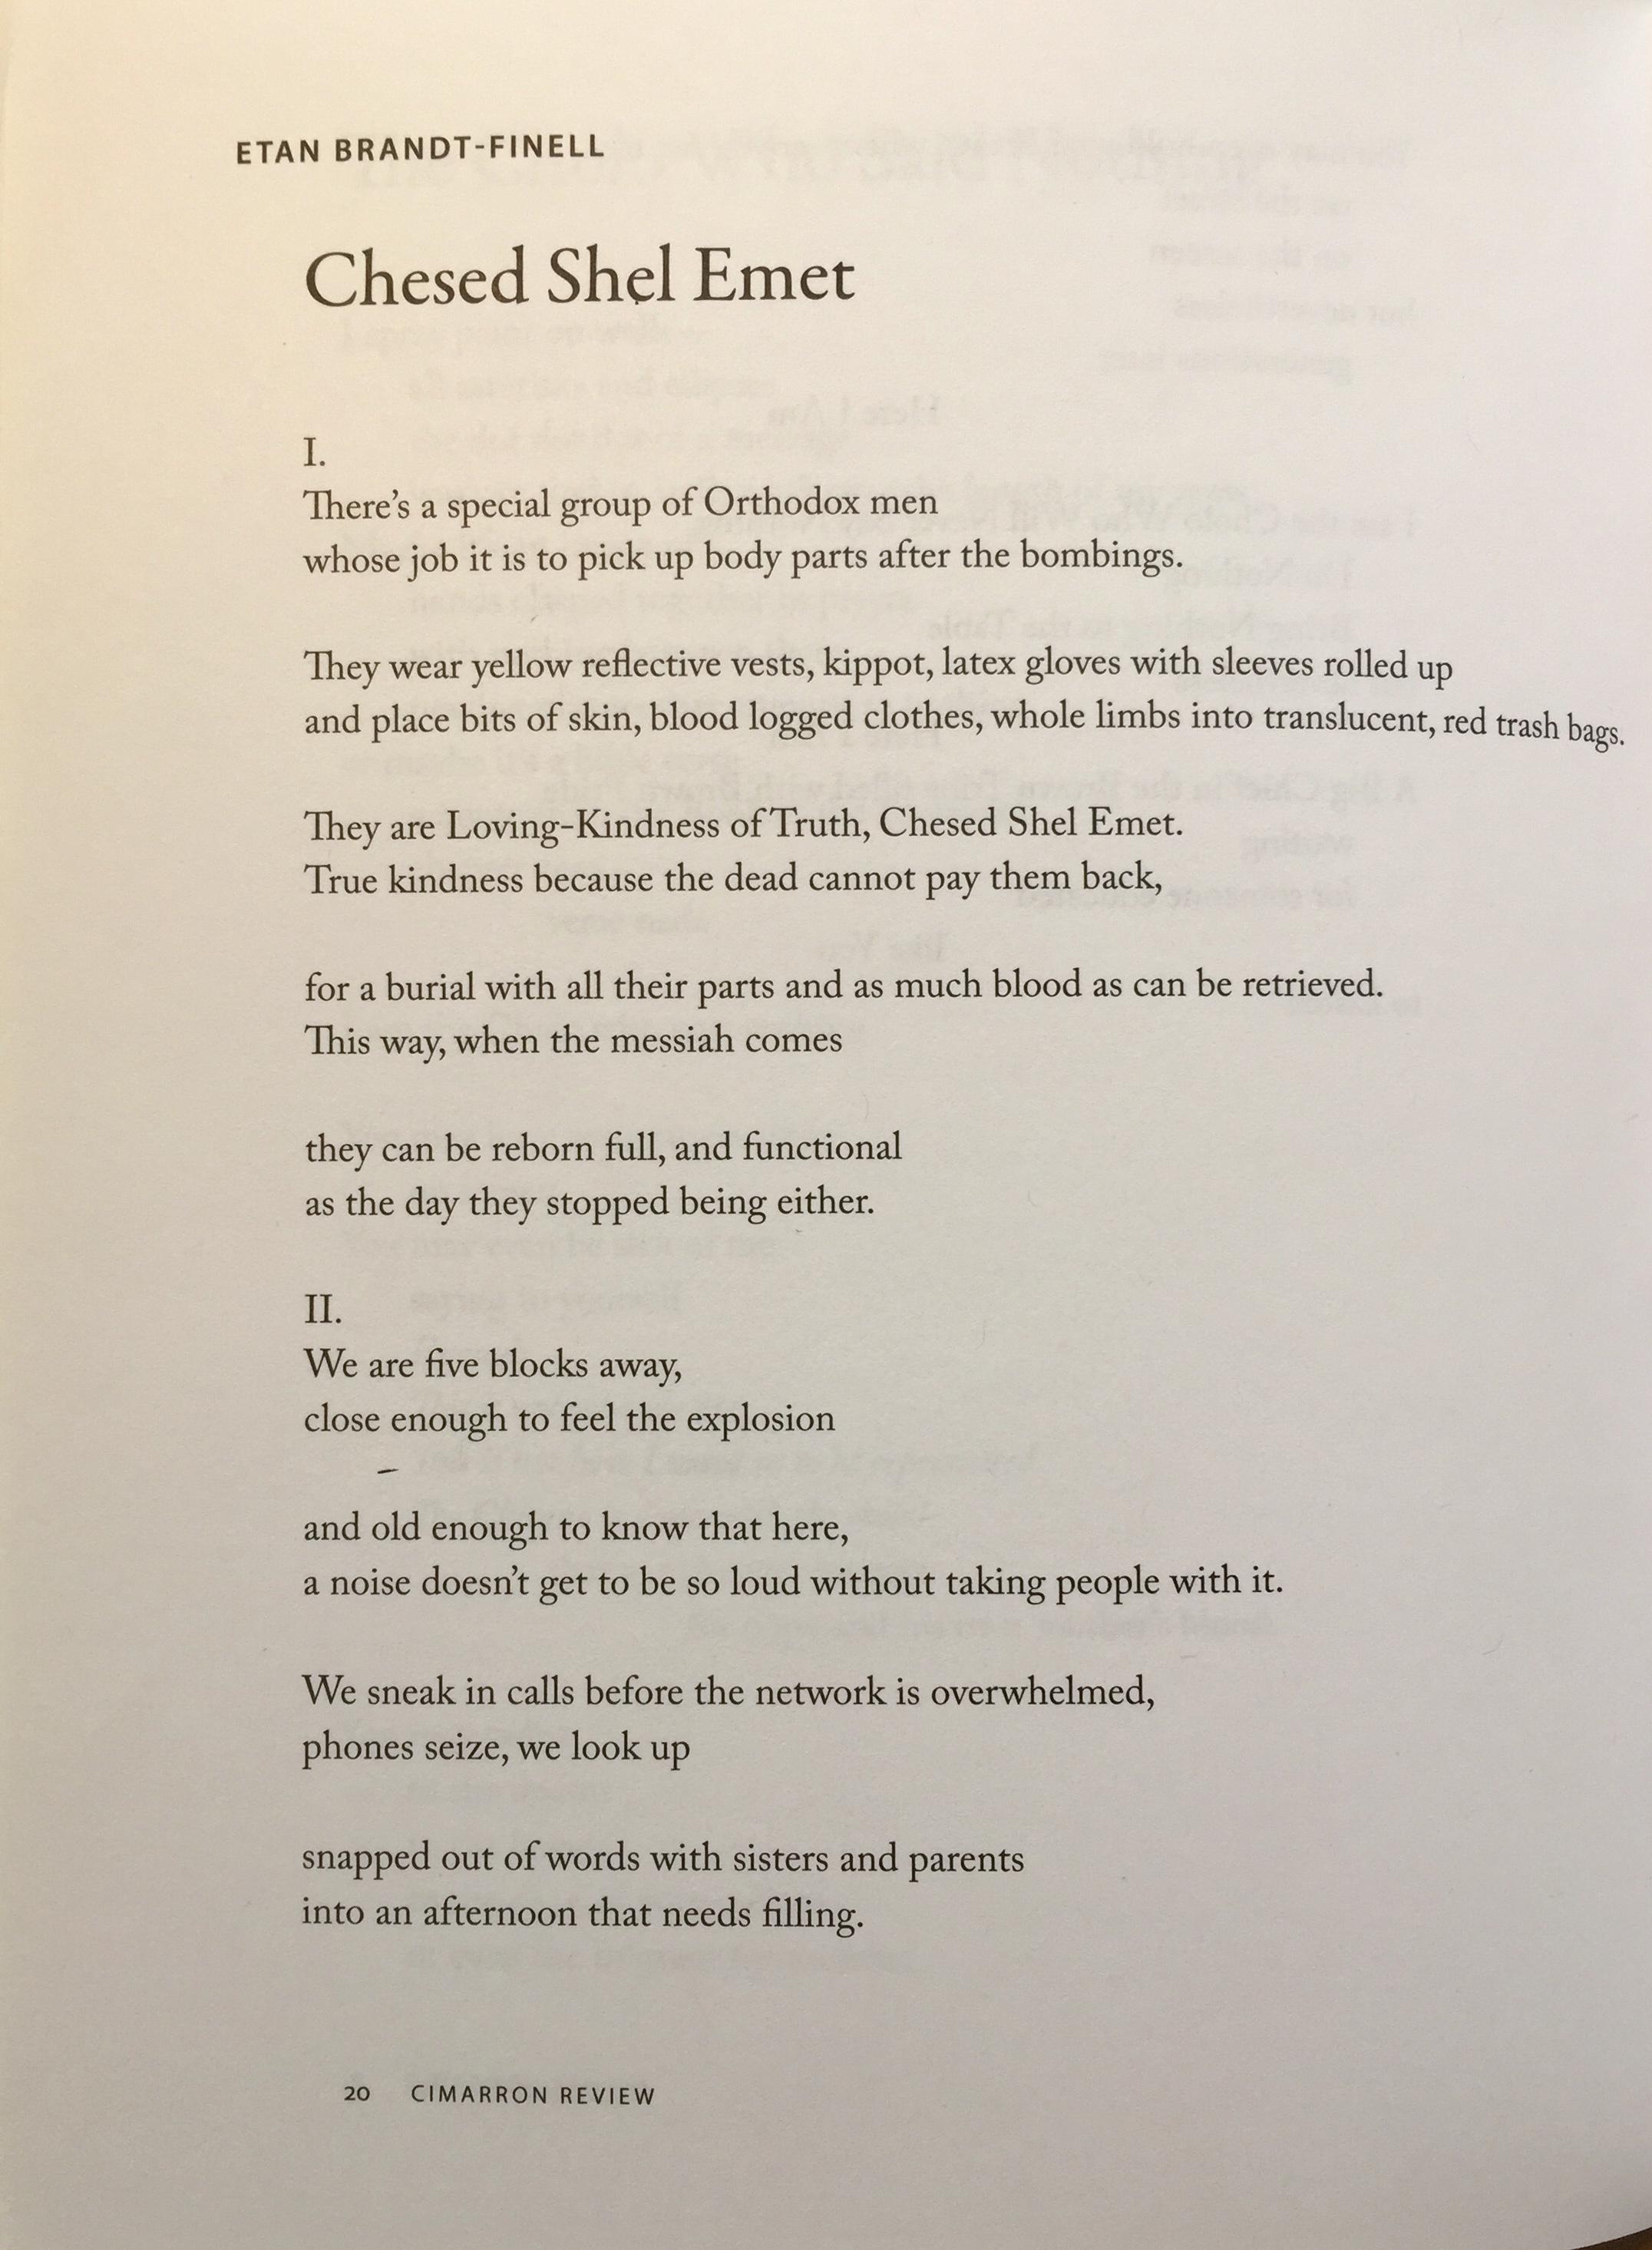 Cimarron Review Poem 2.jpg